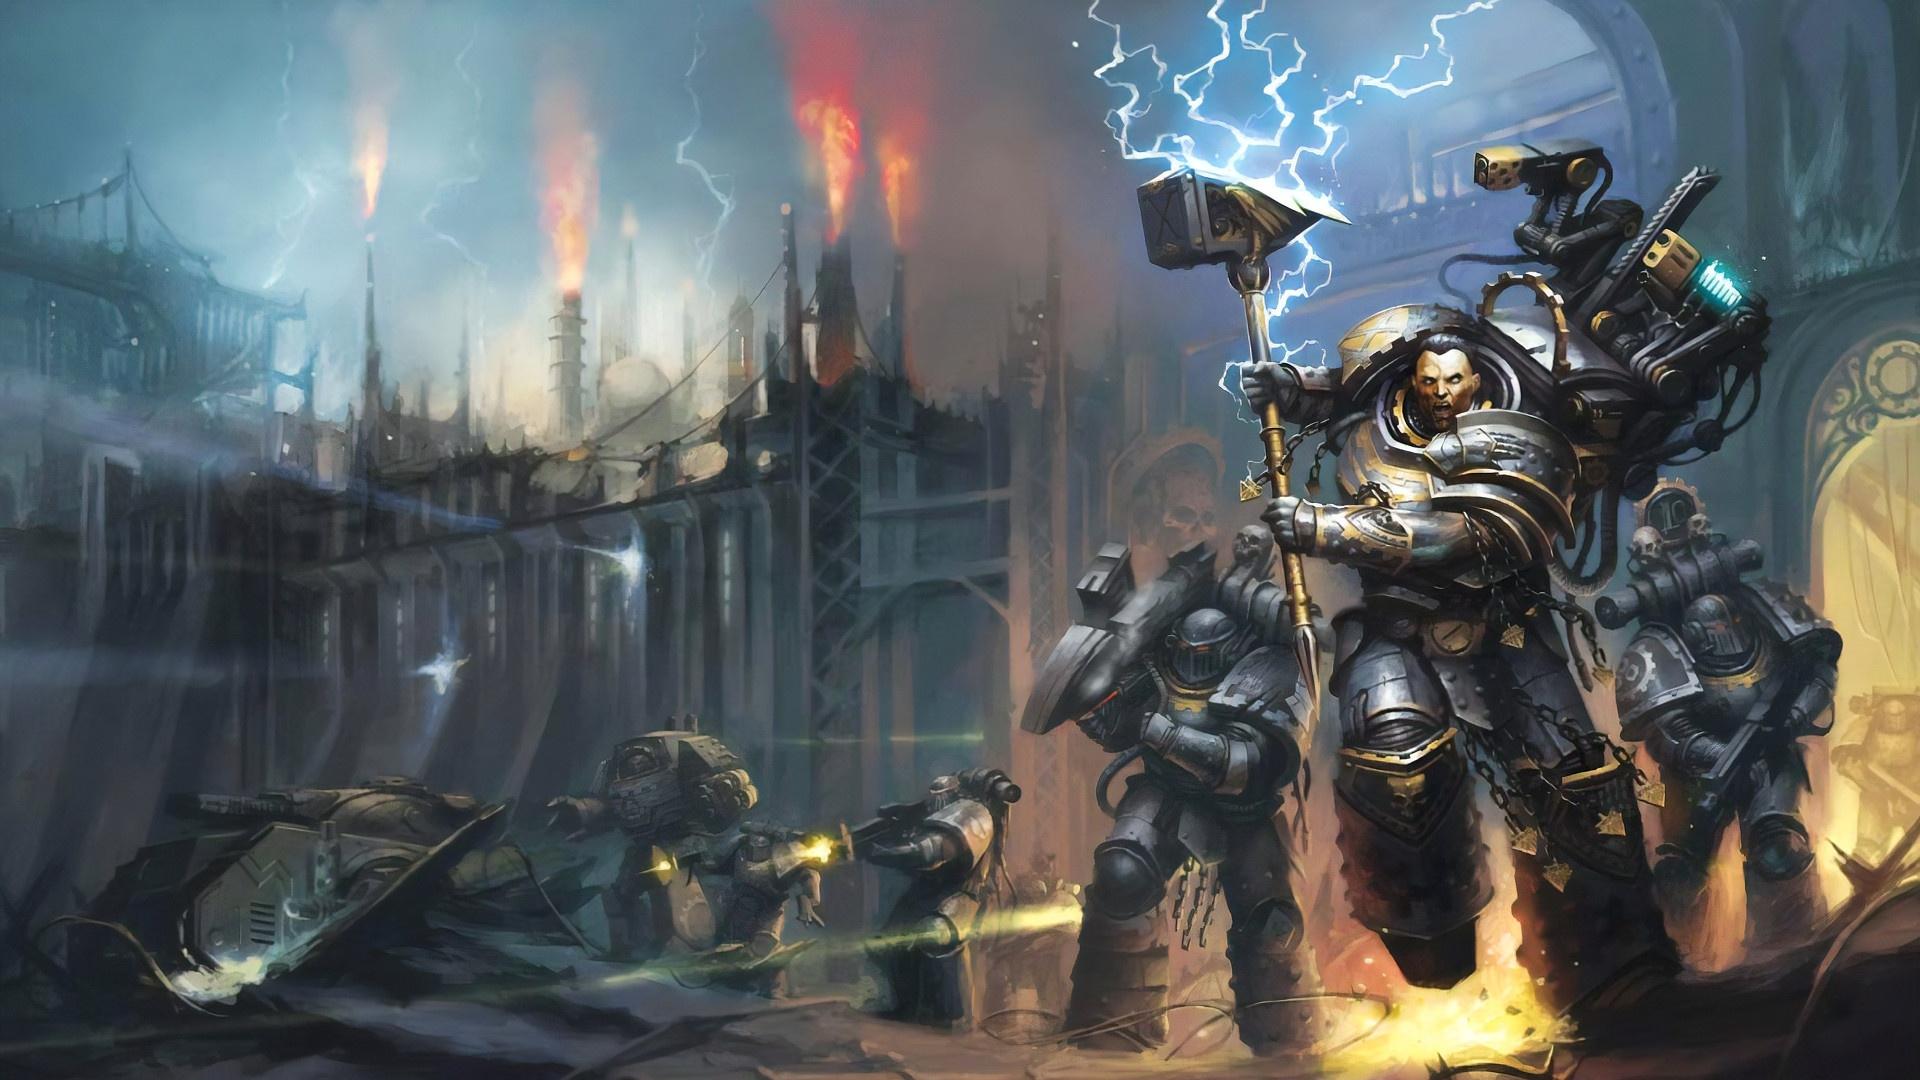 Warhammer 40K Wallpaper, HD Games 4K Wallpapers, Images ...